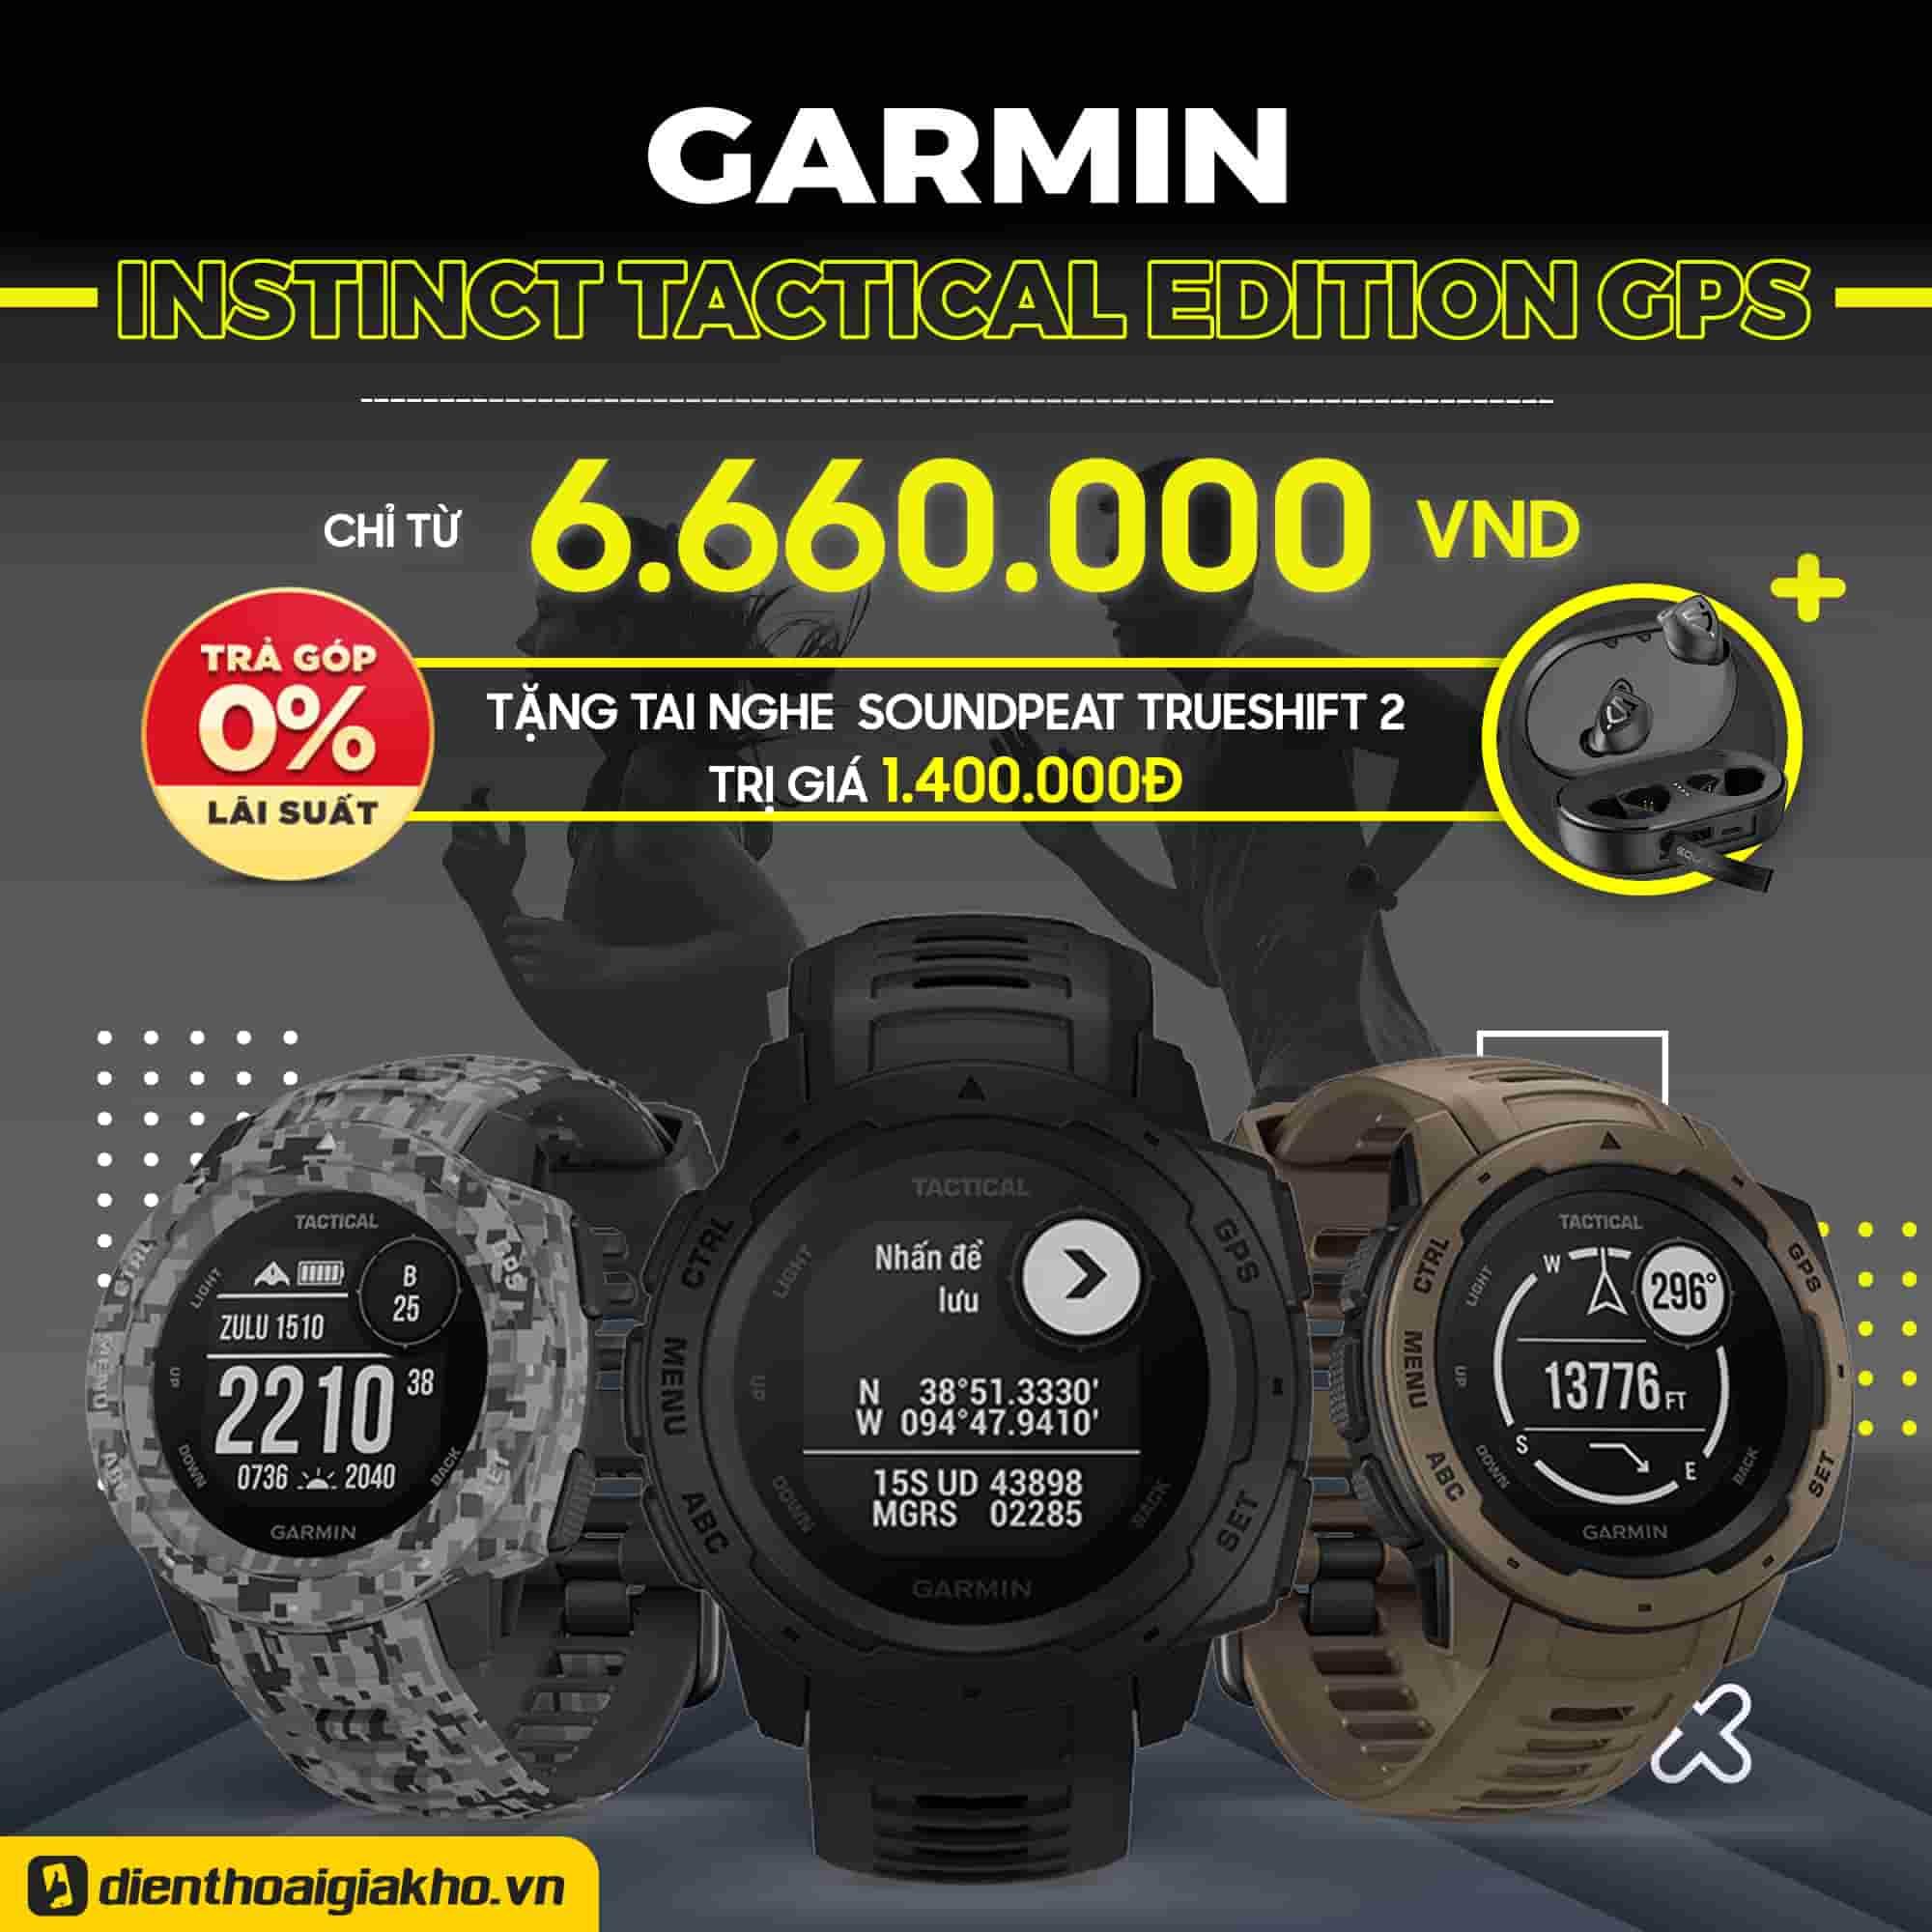 Garmin Watch Instinct Tactical Edition GPS Chính Hãng